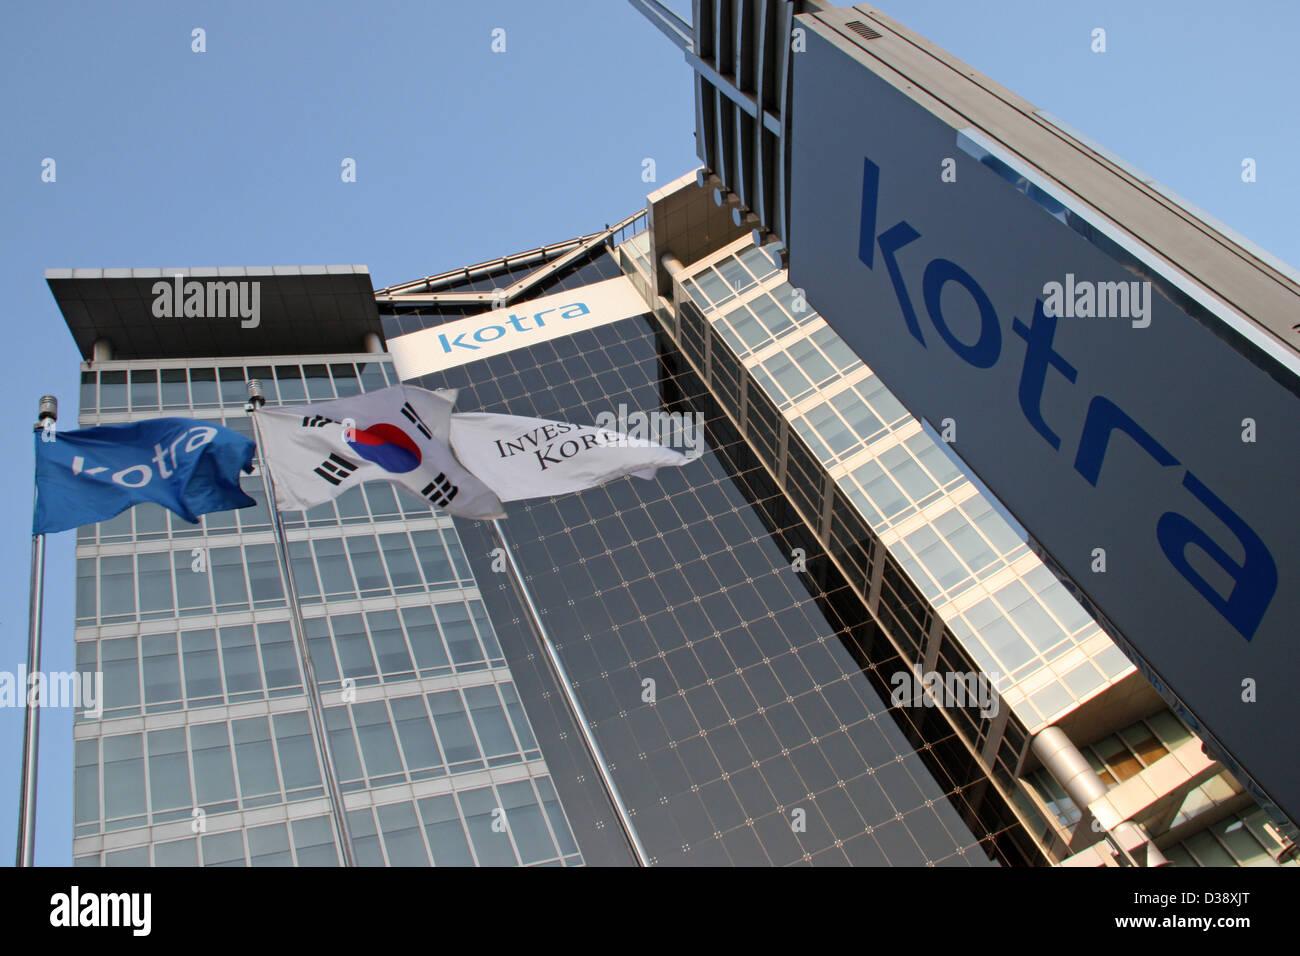 South Korea Kotra Korea Trade Investment Promotion Agency Stock